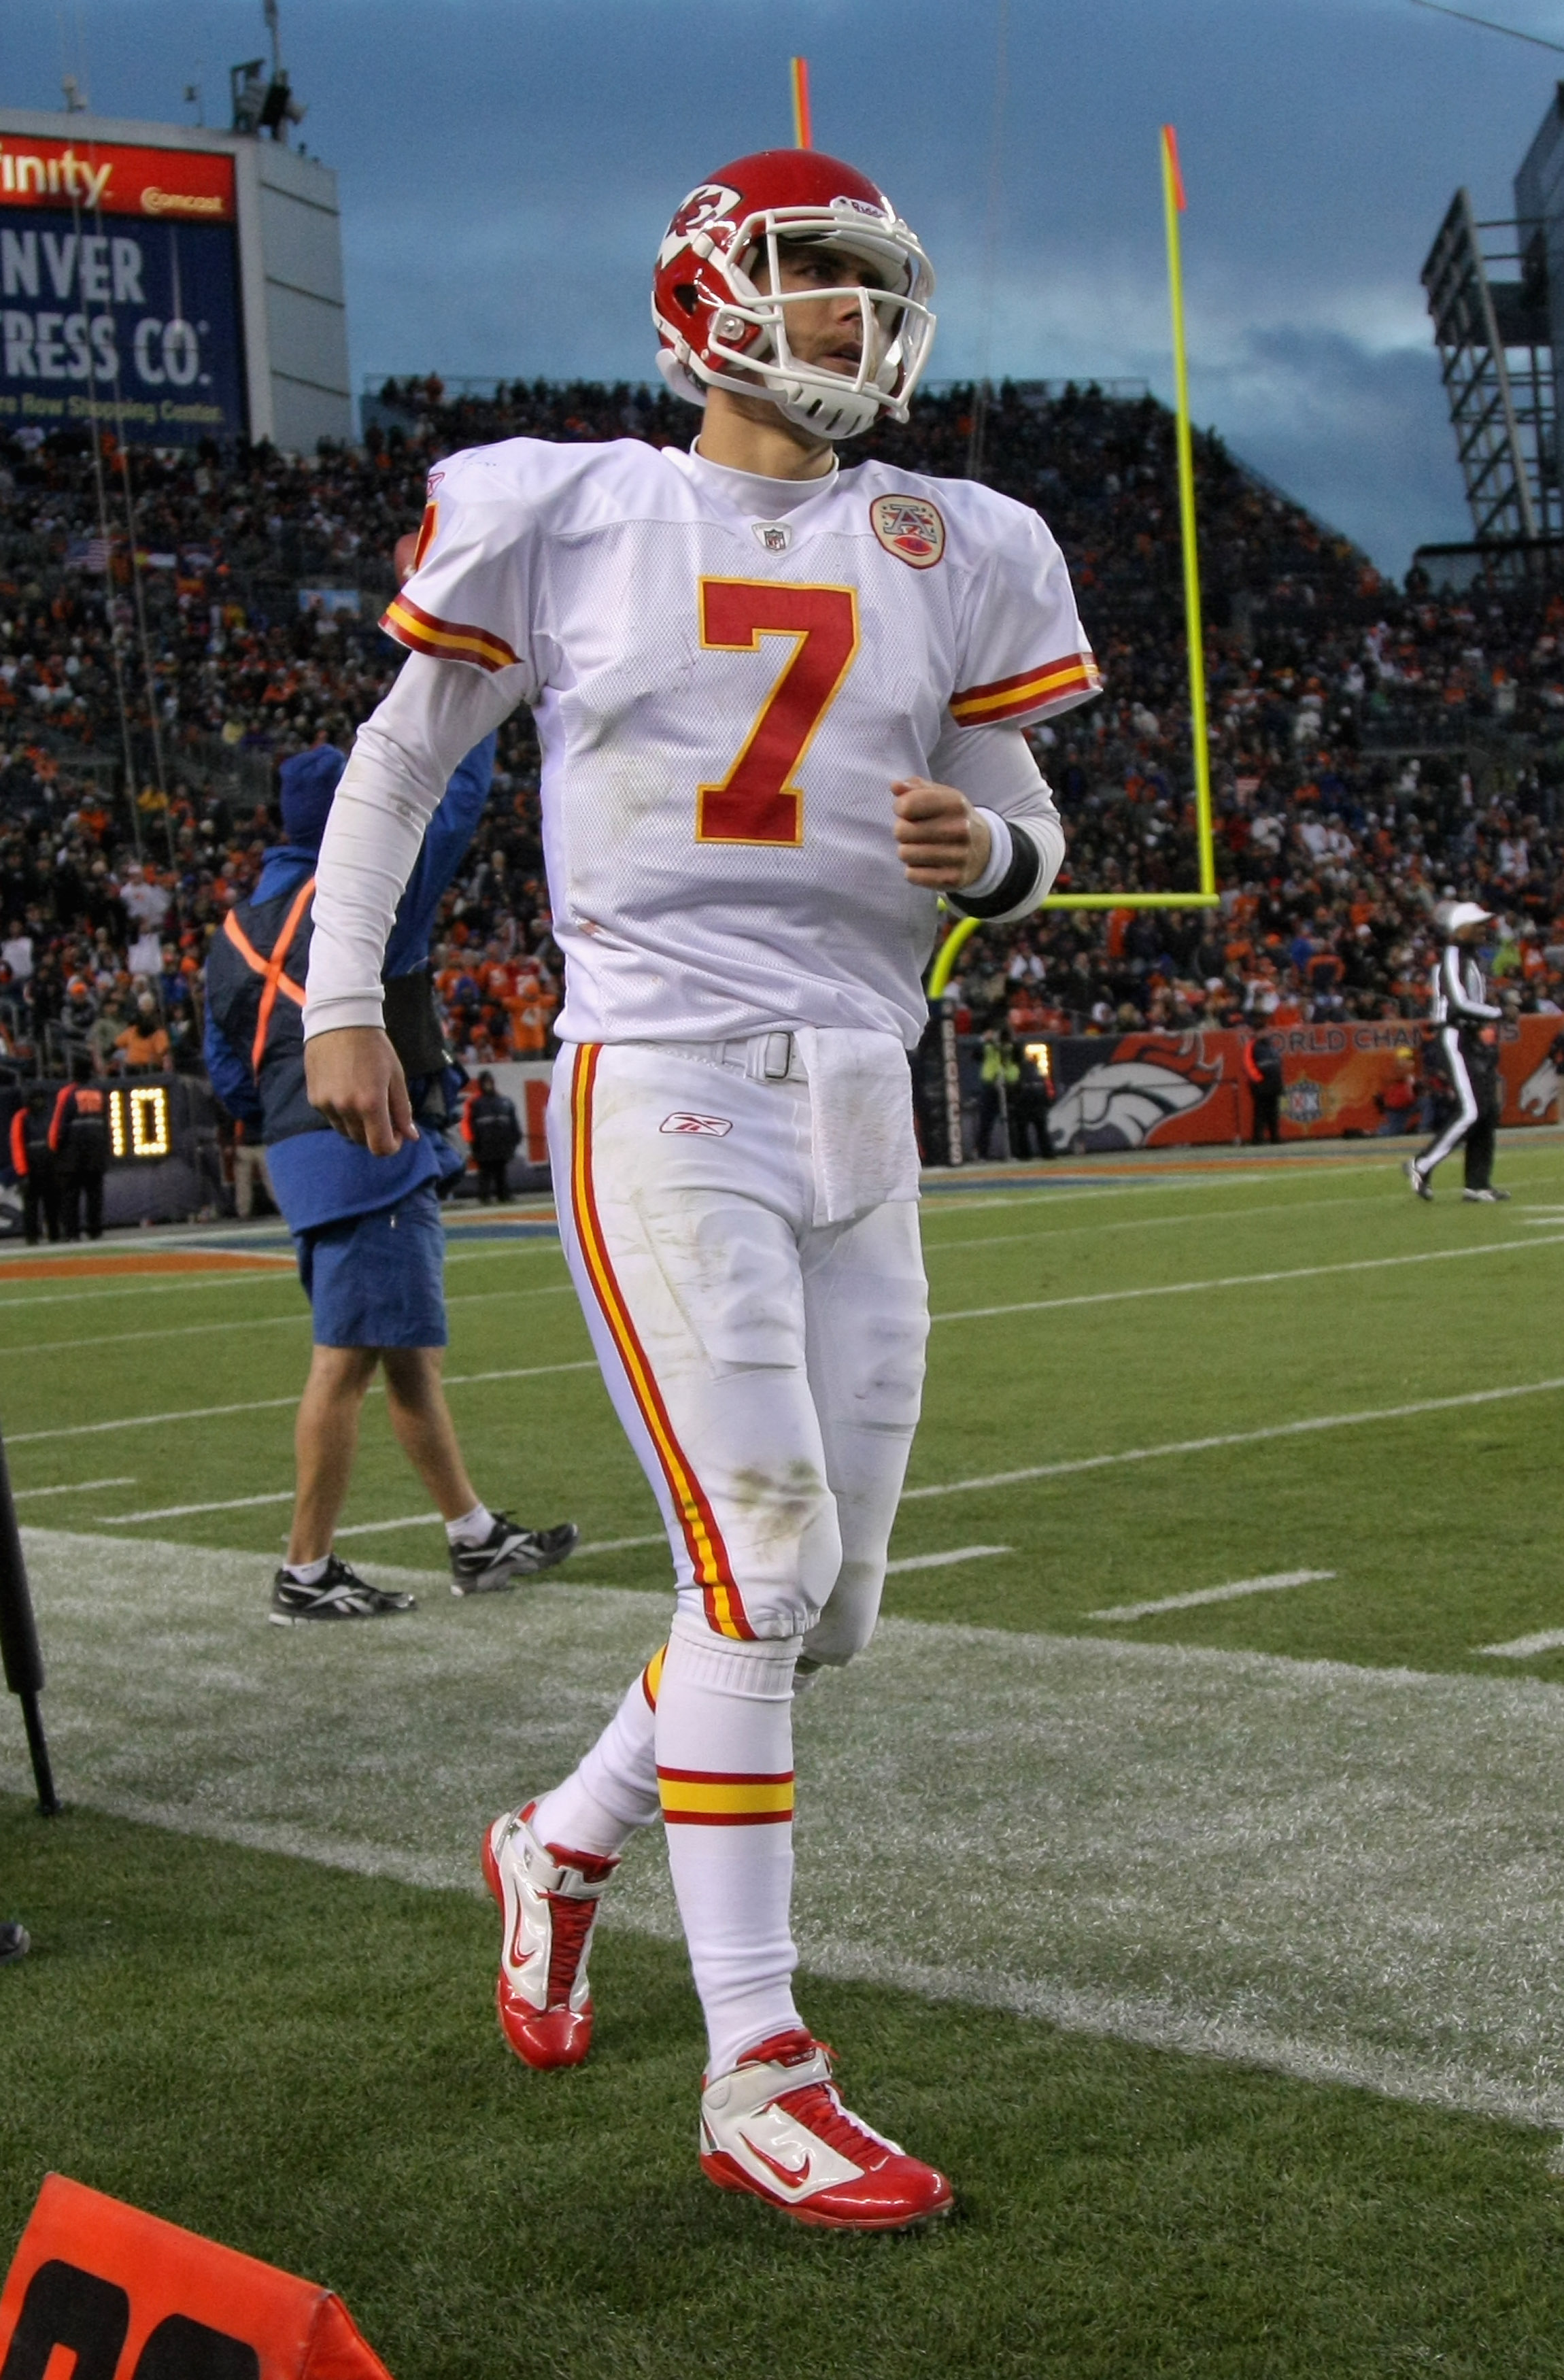 DENVER - NOVEMBER 14:  Quarterback Matt Cassel #7 of the Kansas City Chiefs heads to the bench against the Denver Bronco at INVESCO Field at Mile High on November 14, 2010 in Denver, Colorado. The Broncos defeated the Chiefs 49-29.  (Photo by Doug Pensing